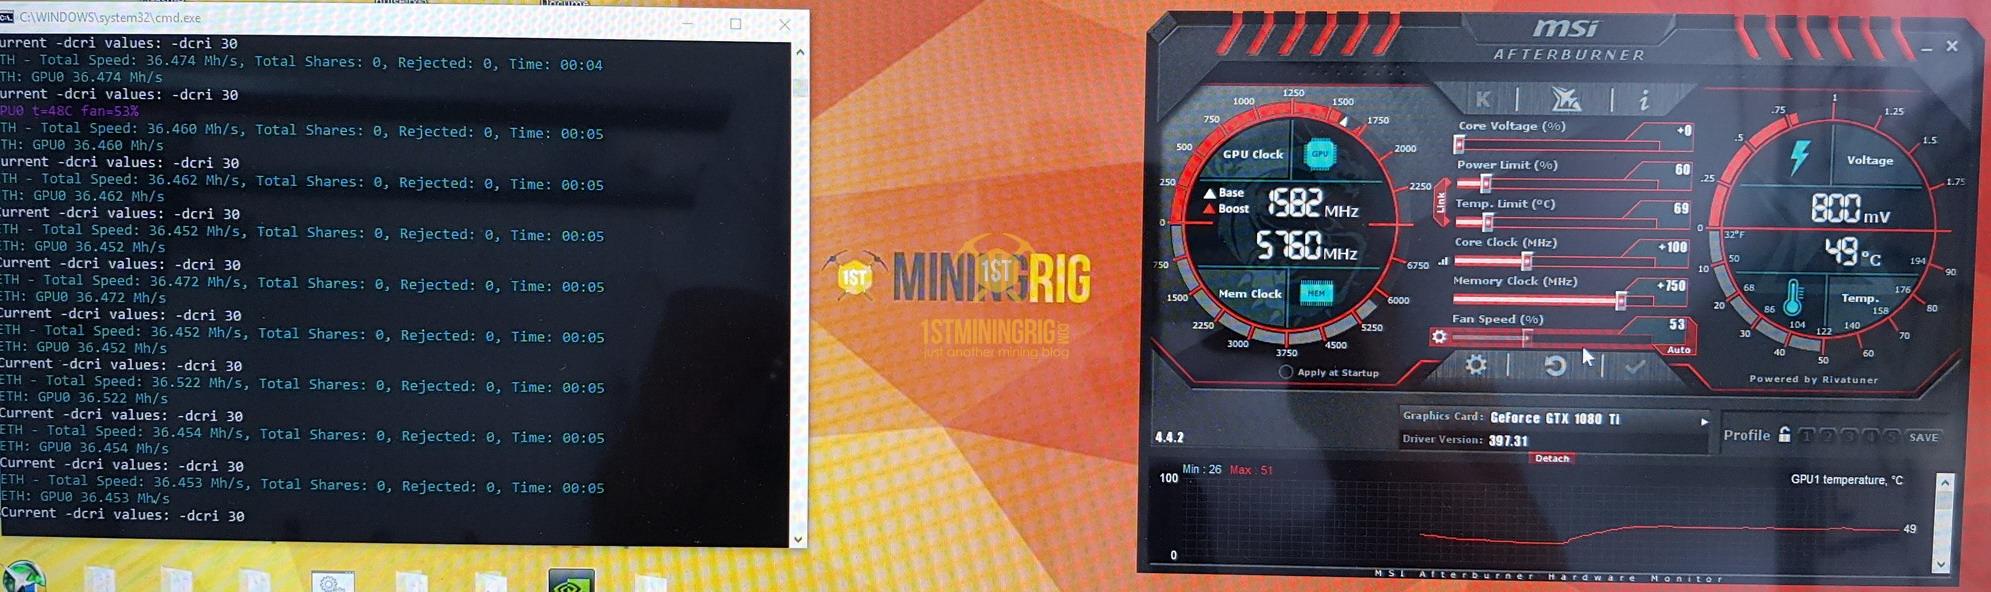 Gigabyte GTX 1080 Ti Gaming OC BLACK Mining Performance